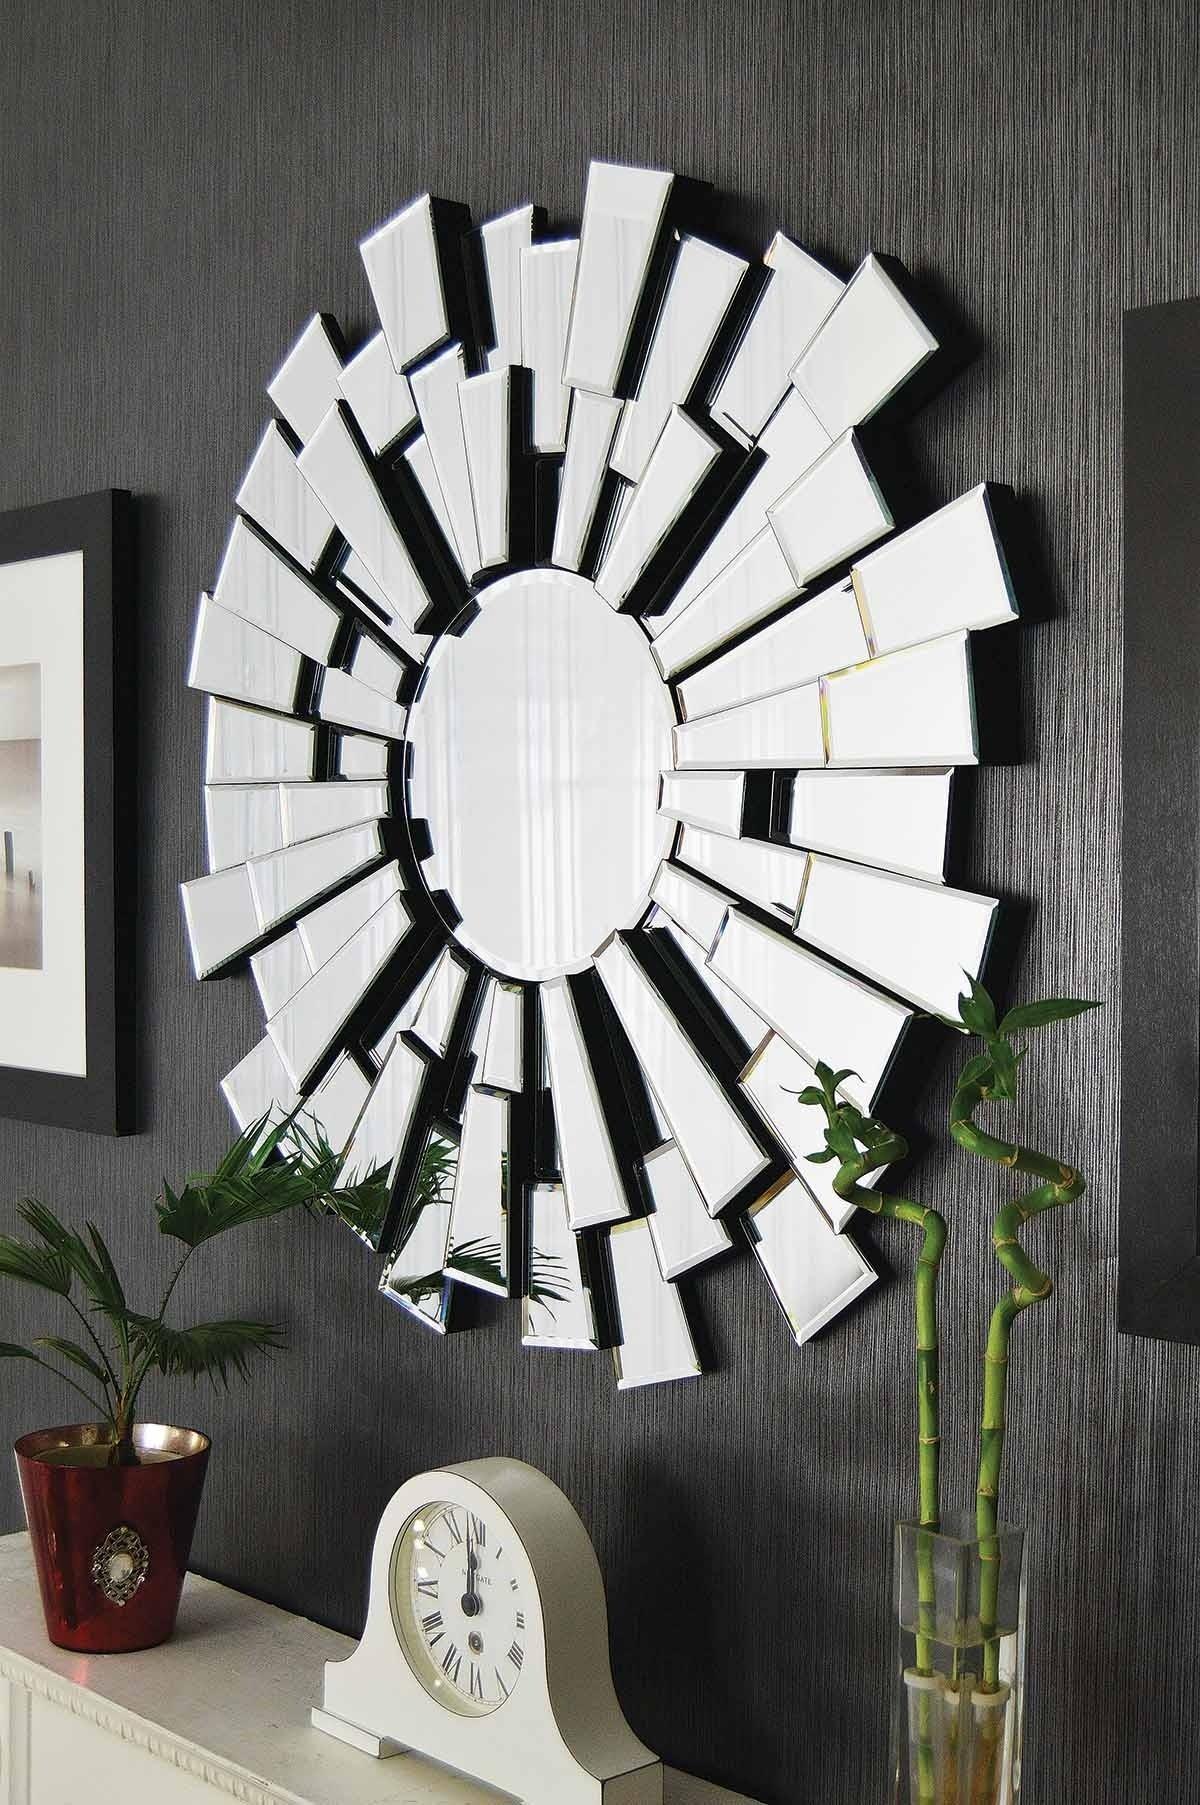 Big Wall Mirrors With Circle Mirrors For Walls 3 Things You Need With Mirror Circles For Walls (View 13 of 15)